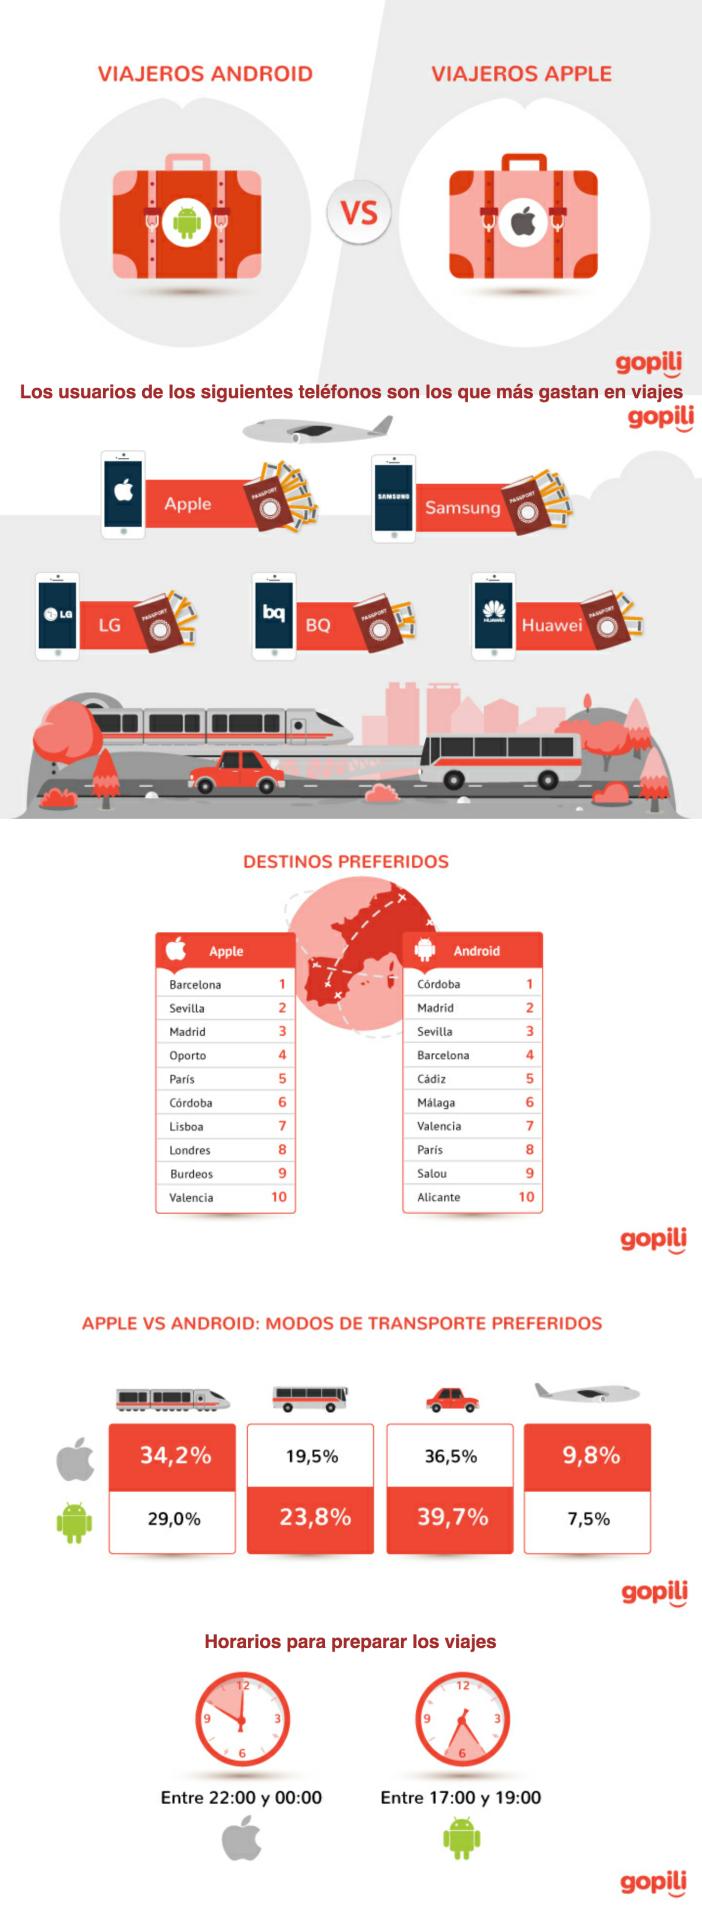 Viajeros Apple vs viajeros Android